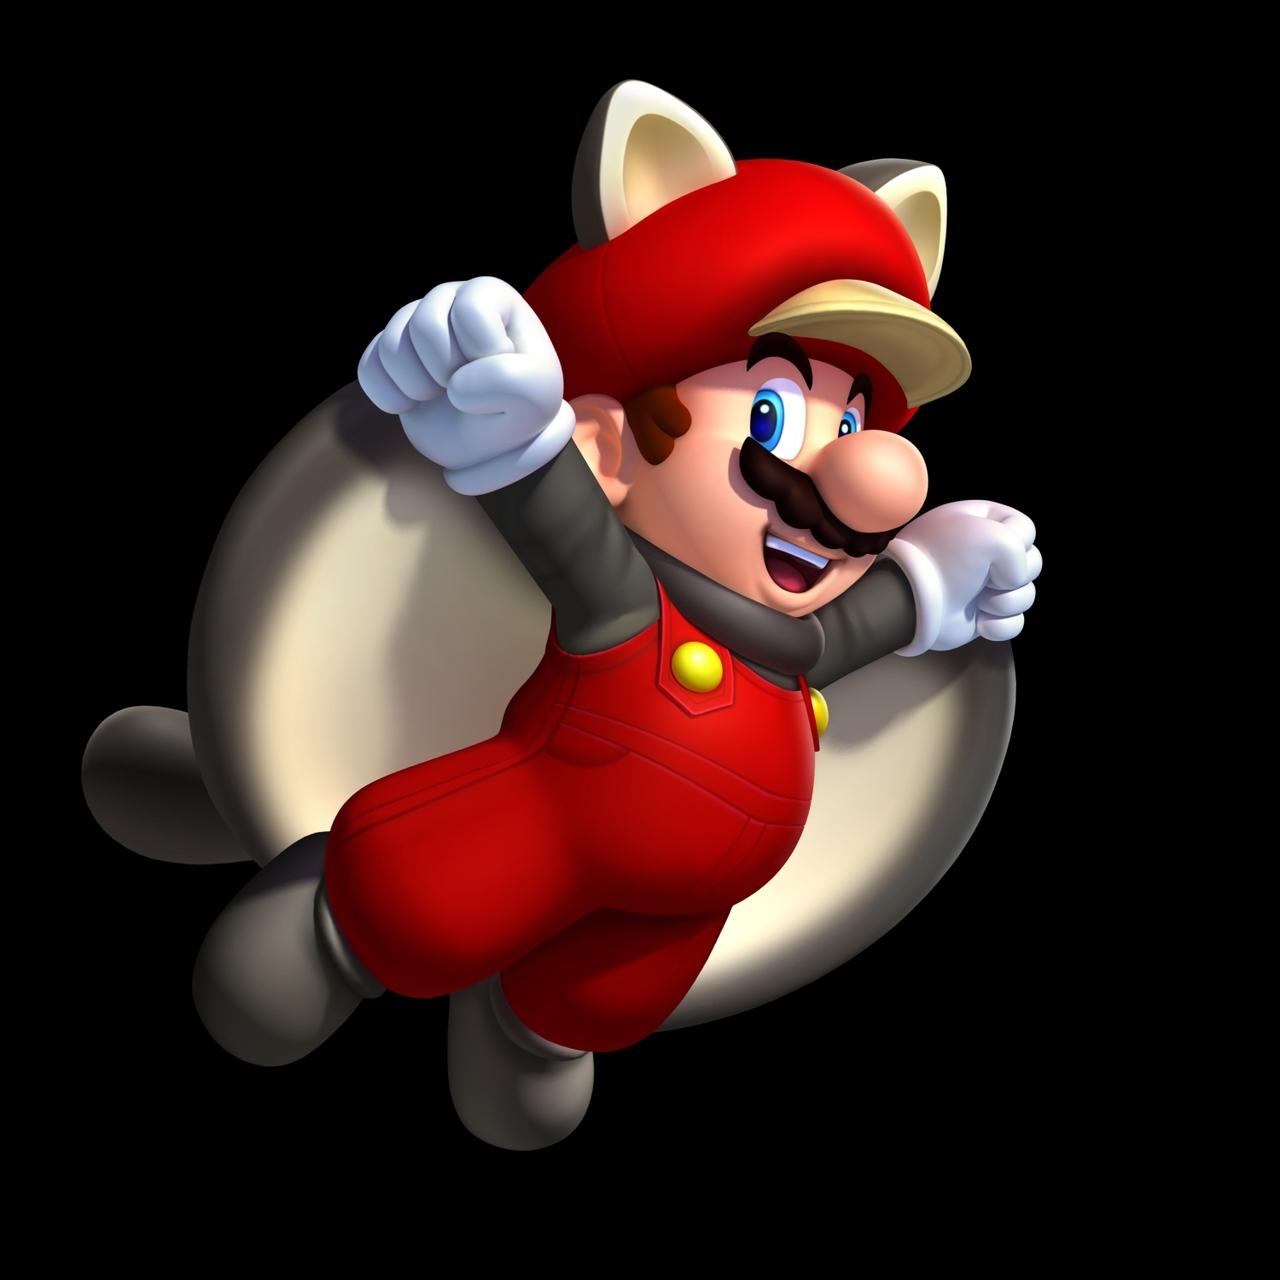 jeuxvideo.com New Super Mario Bros. U - Wii U Image 30 sur 266